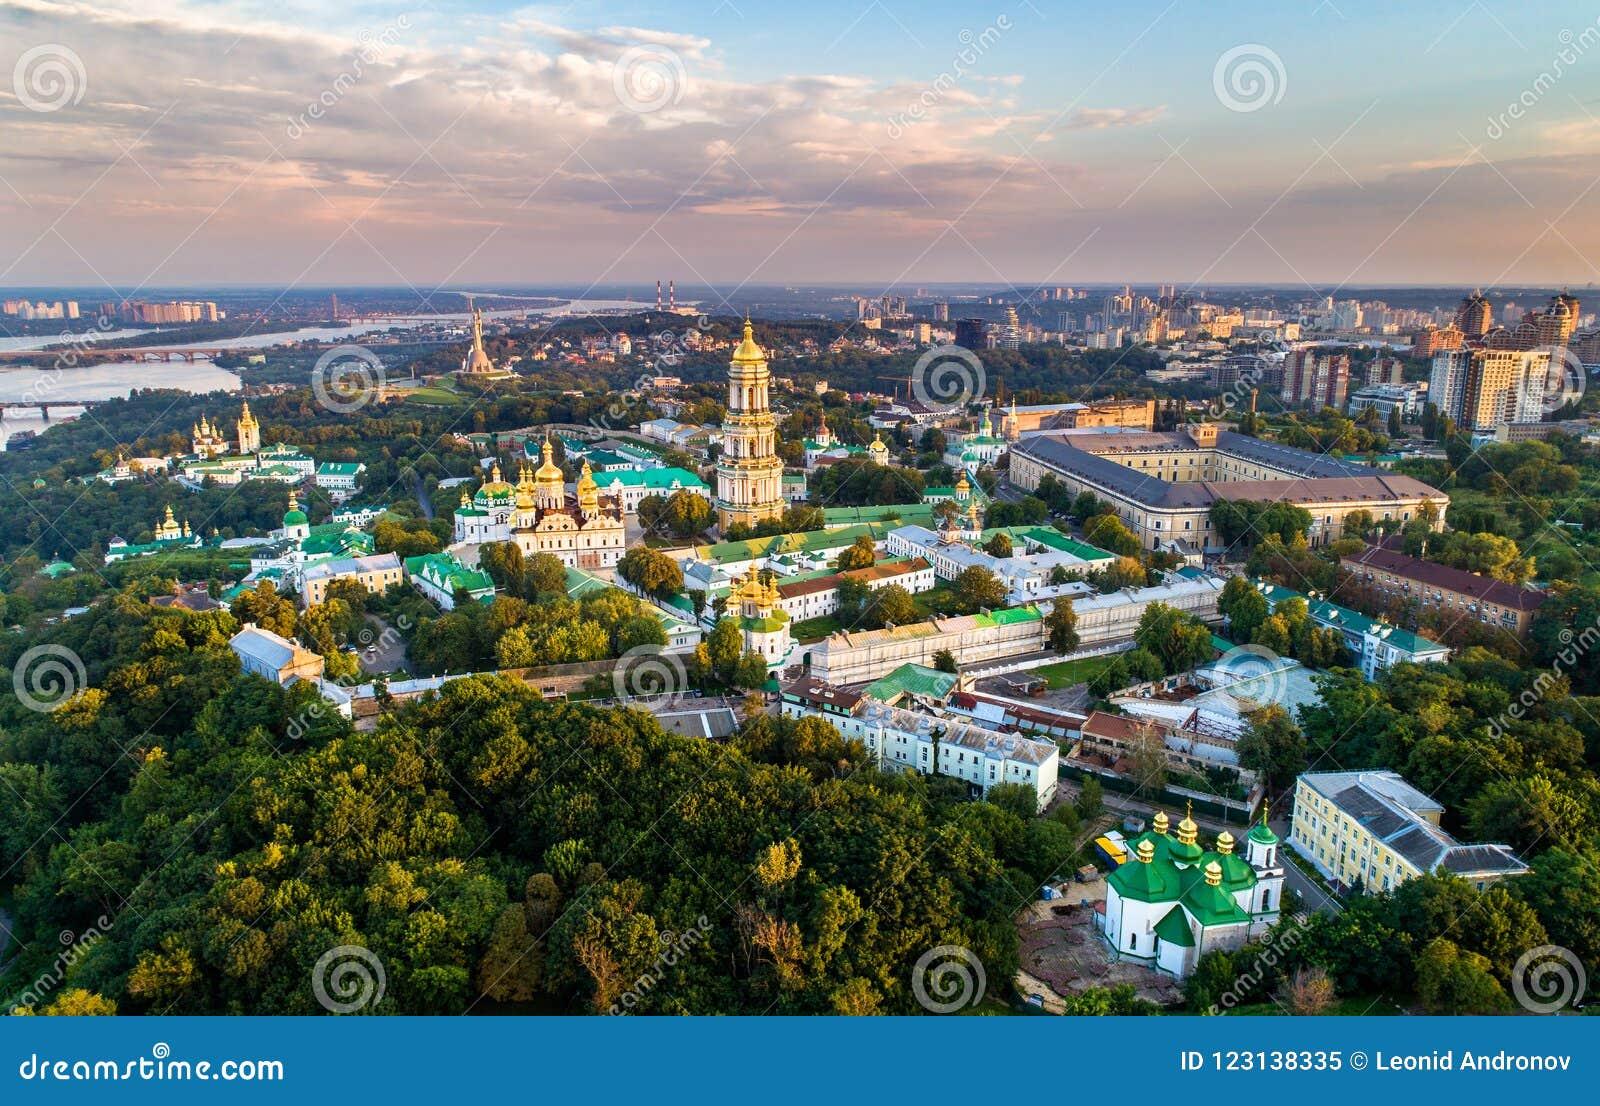 Vue aérienne de Pechersk Lavra à Kiev, la capitale de l Ukraine